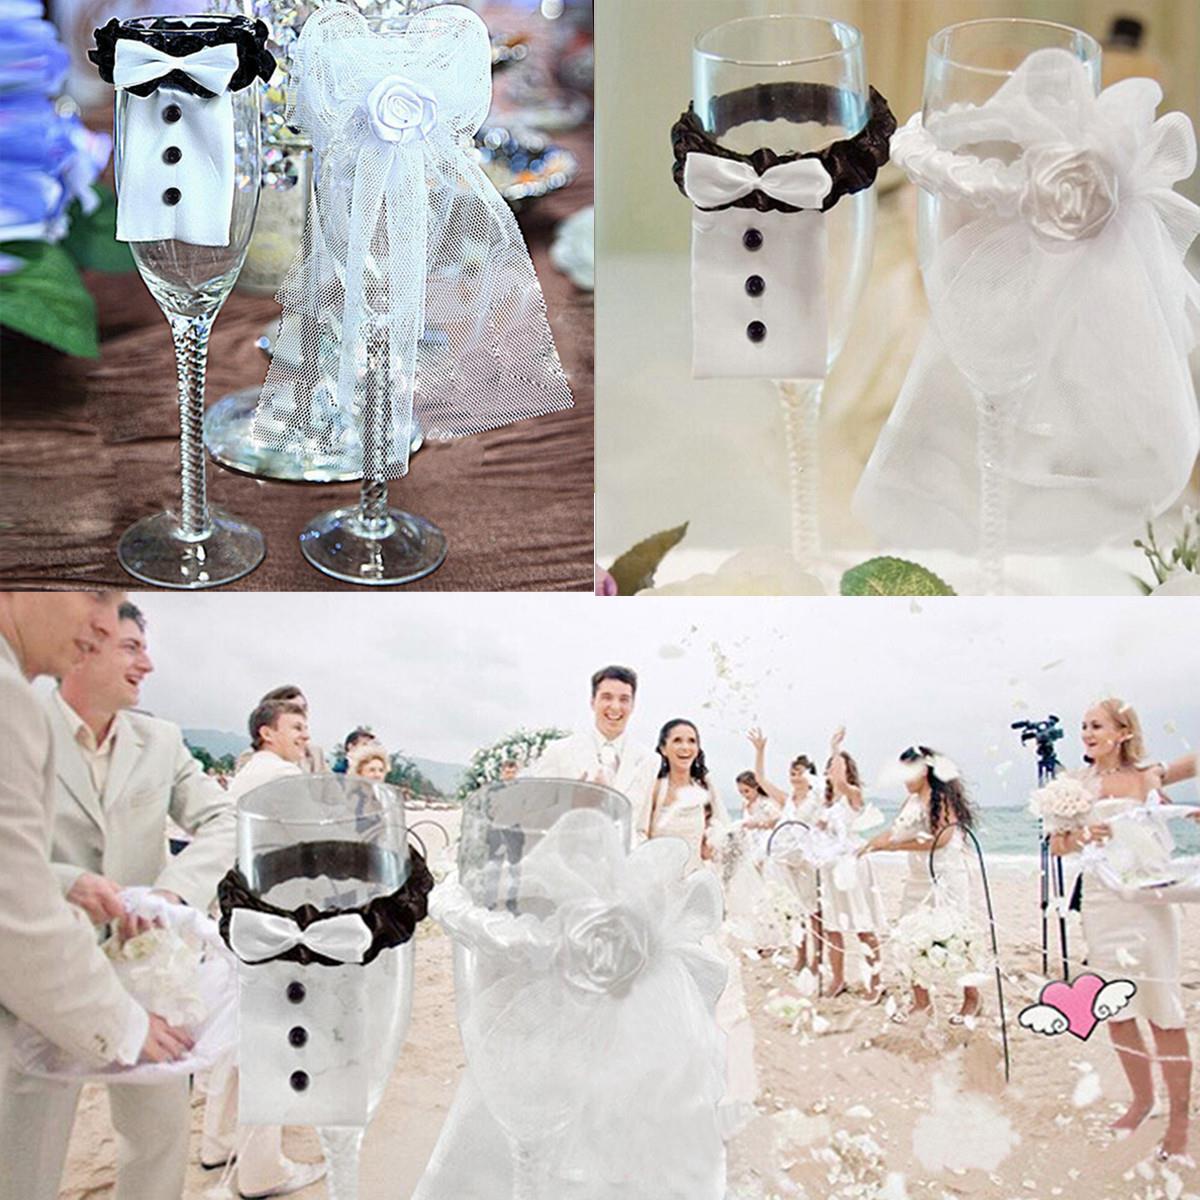 2018 Wedding Dress Mariage Decorations Bride Groom Wine Glass Decor ...